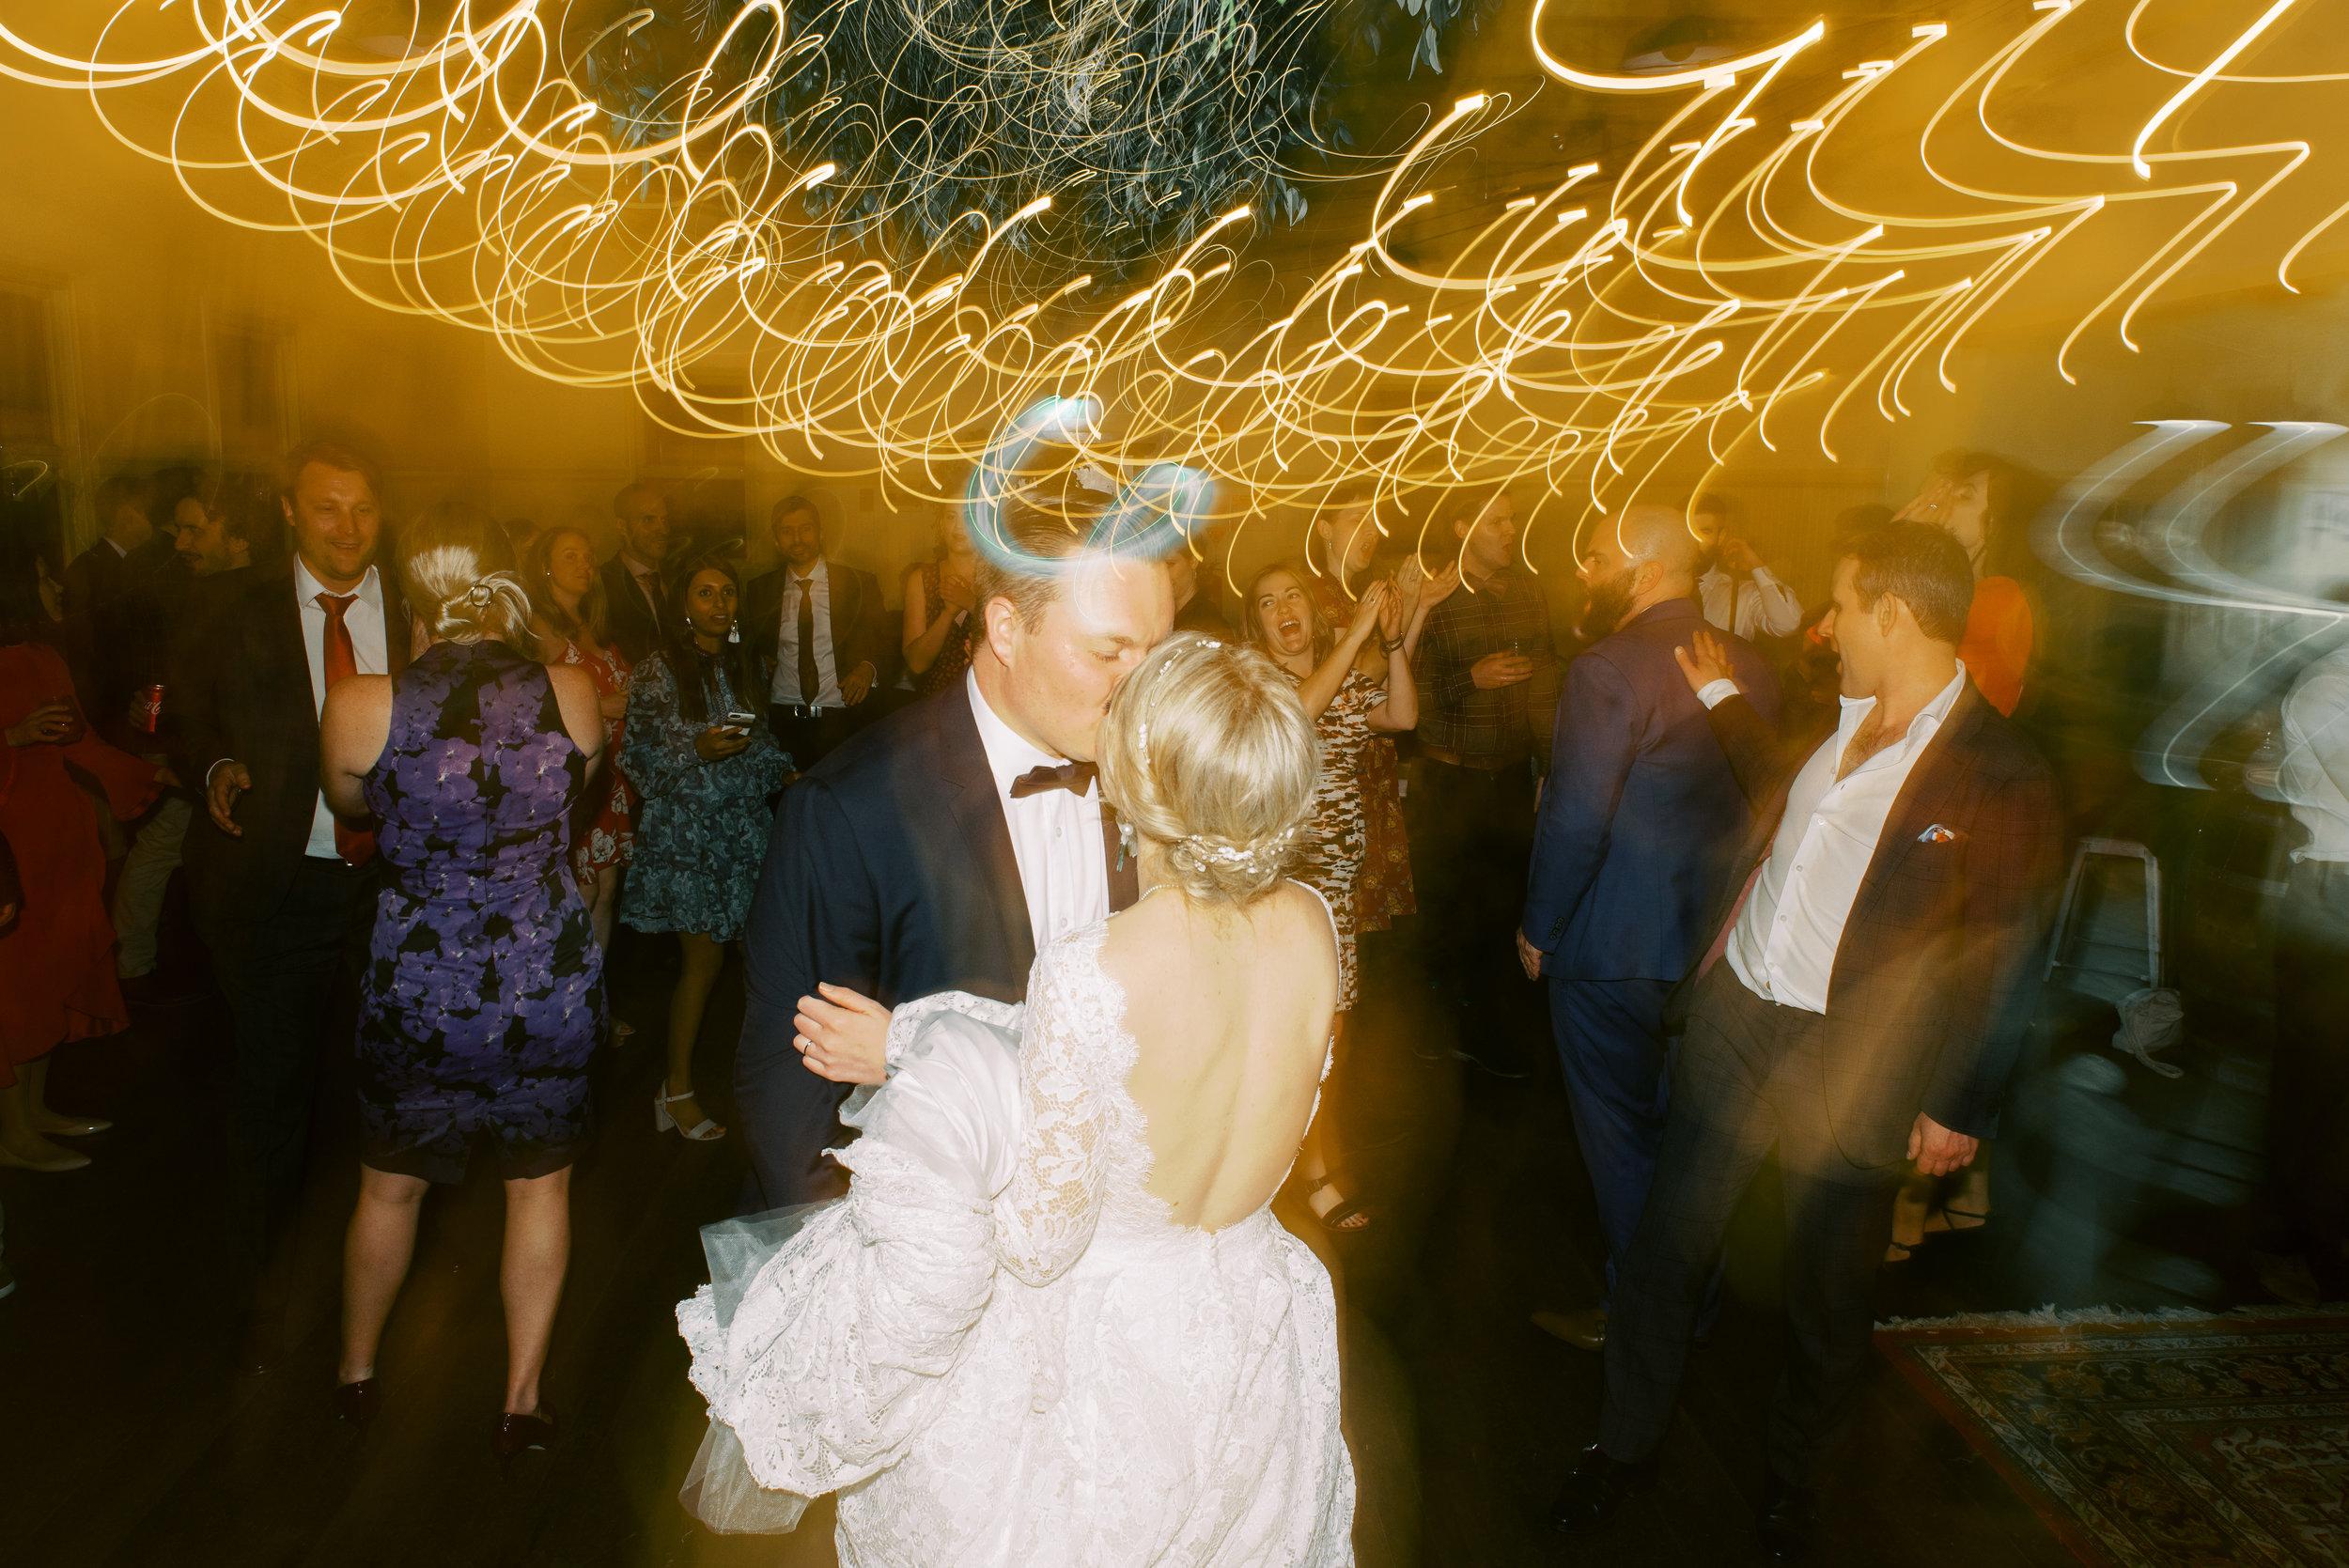 brisbane-gold-coast-sunshine-coast-tweed-romantic-fine-art-wedding-photography-lauren-olivia-93.jpg